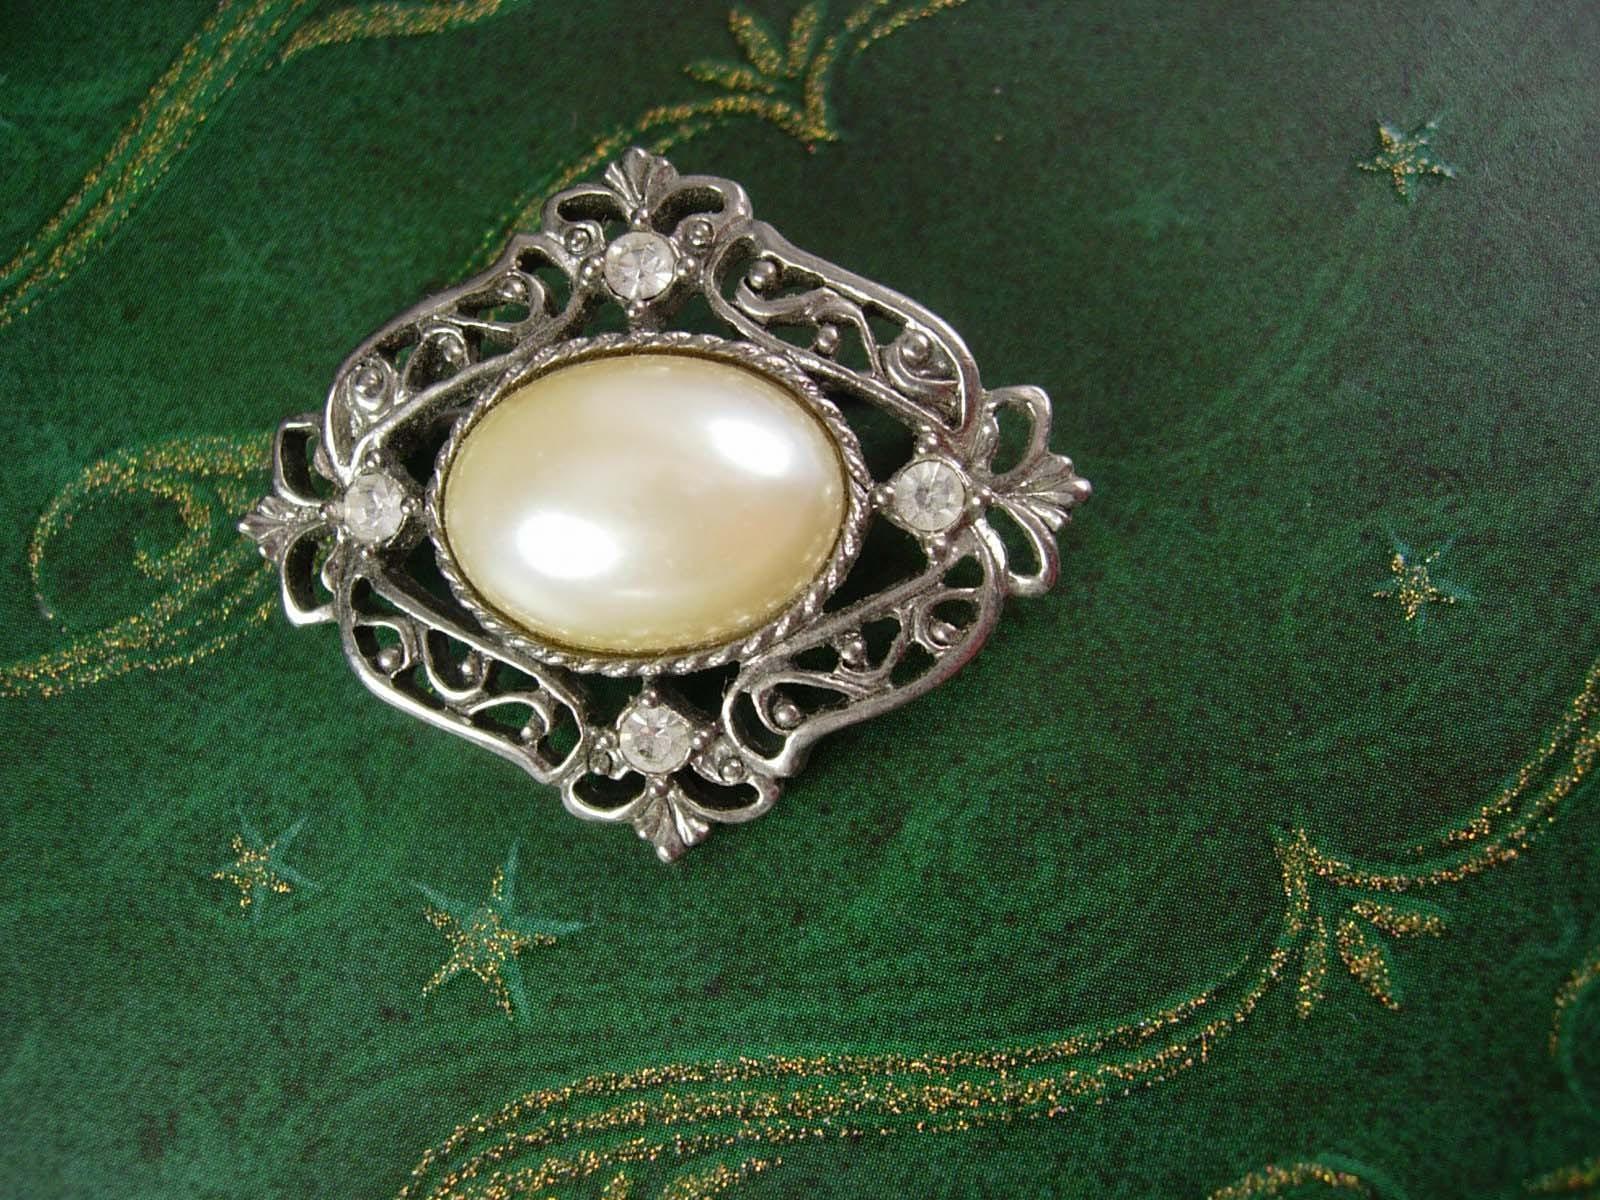 Edwardian Style Brooch Vintage Faux Pearl Rhinestone Pin